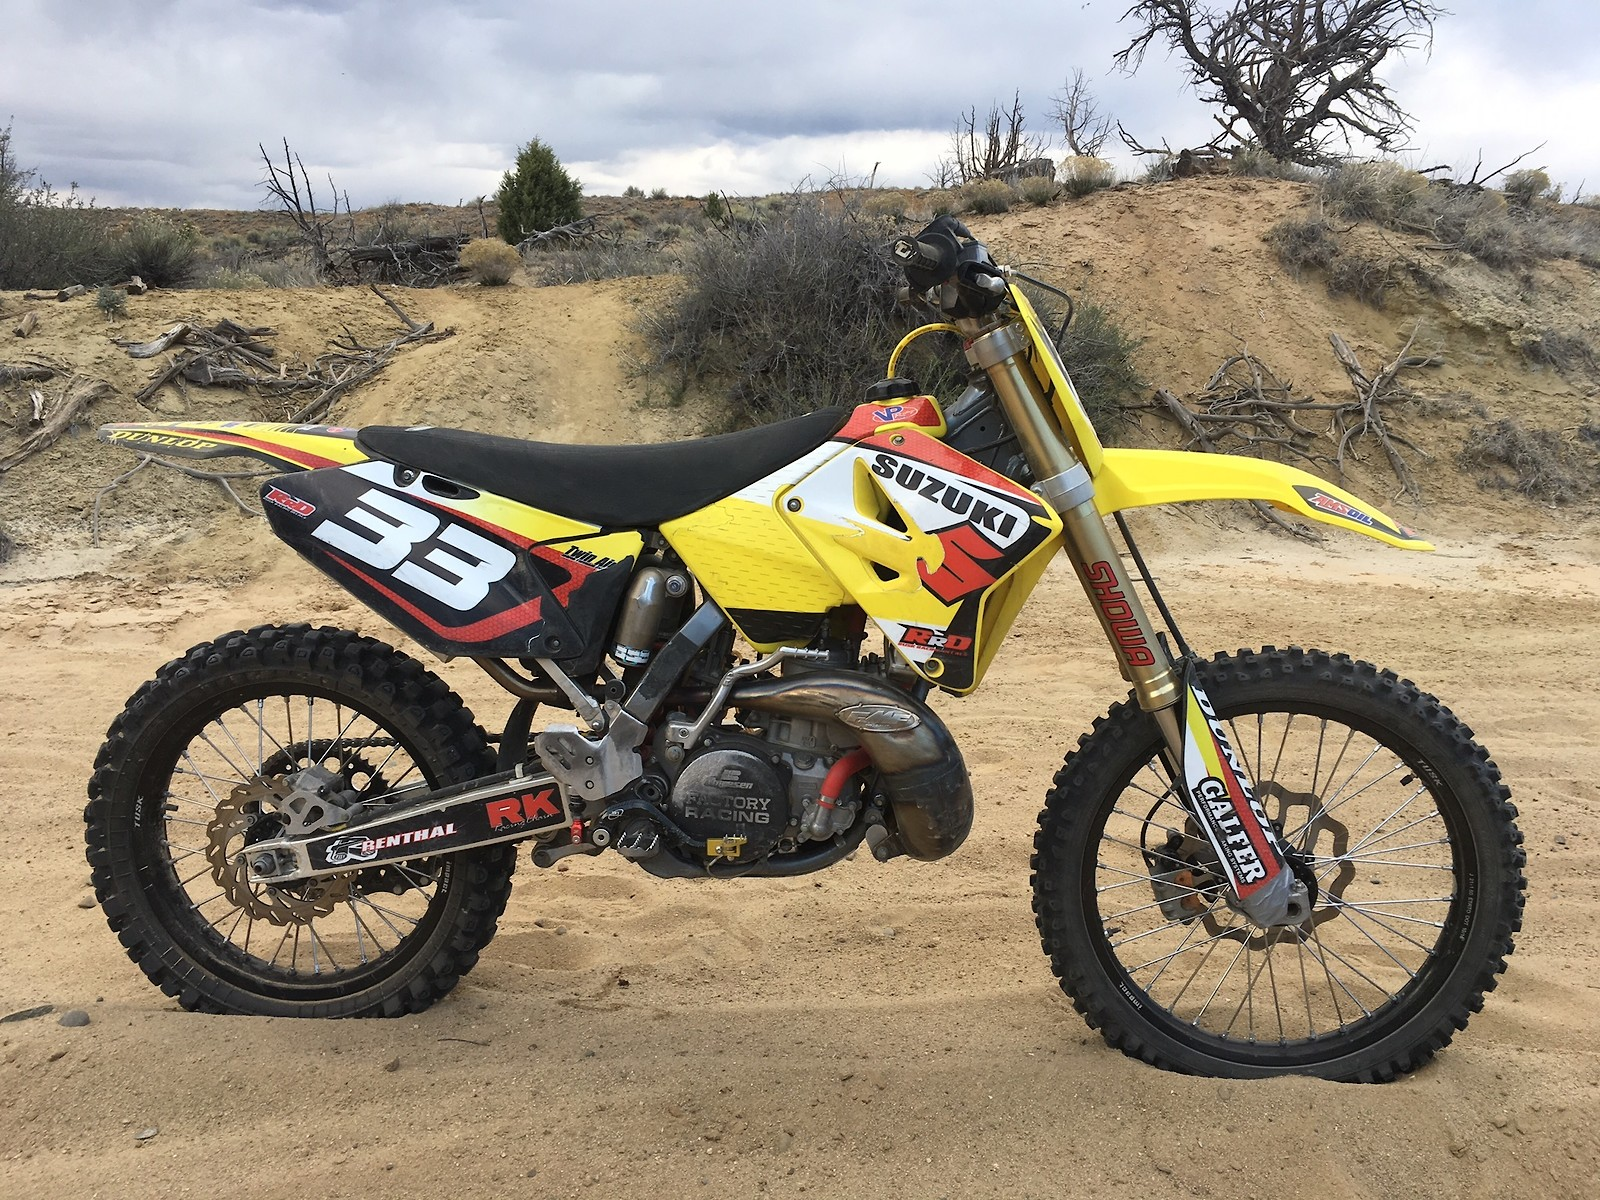 E42C4304-036F-414D-B67C-7A2912F2D09D - Malone - Motocross Pictures - Vital MX